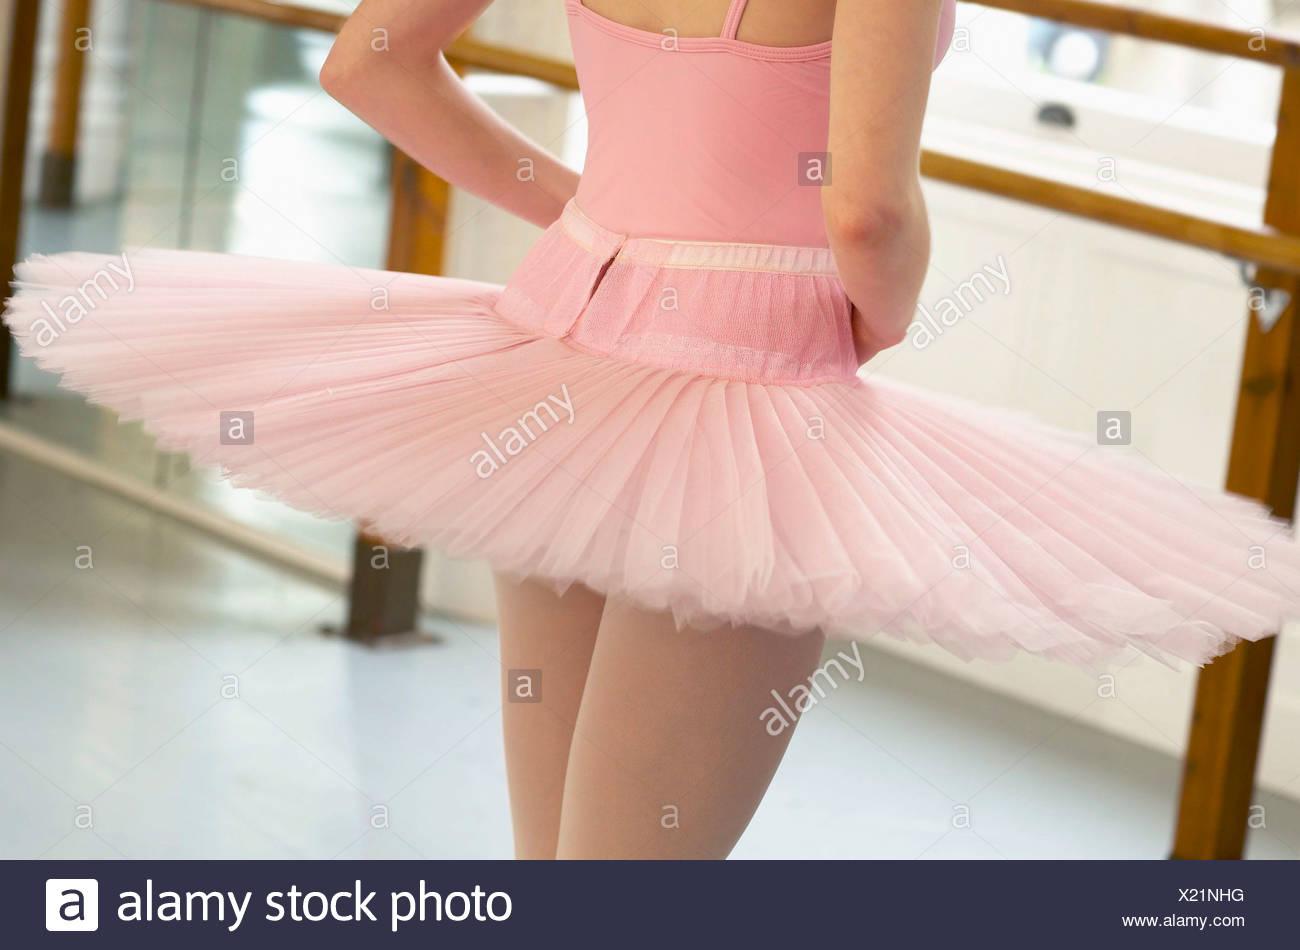 510cc287f Ballerina's tutu Stock Photo: 276634108 - Alamy